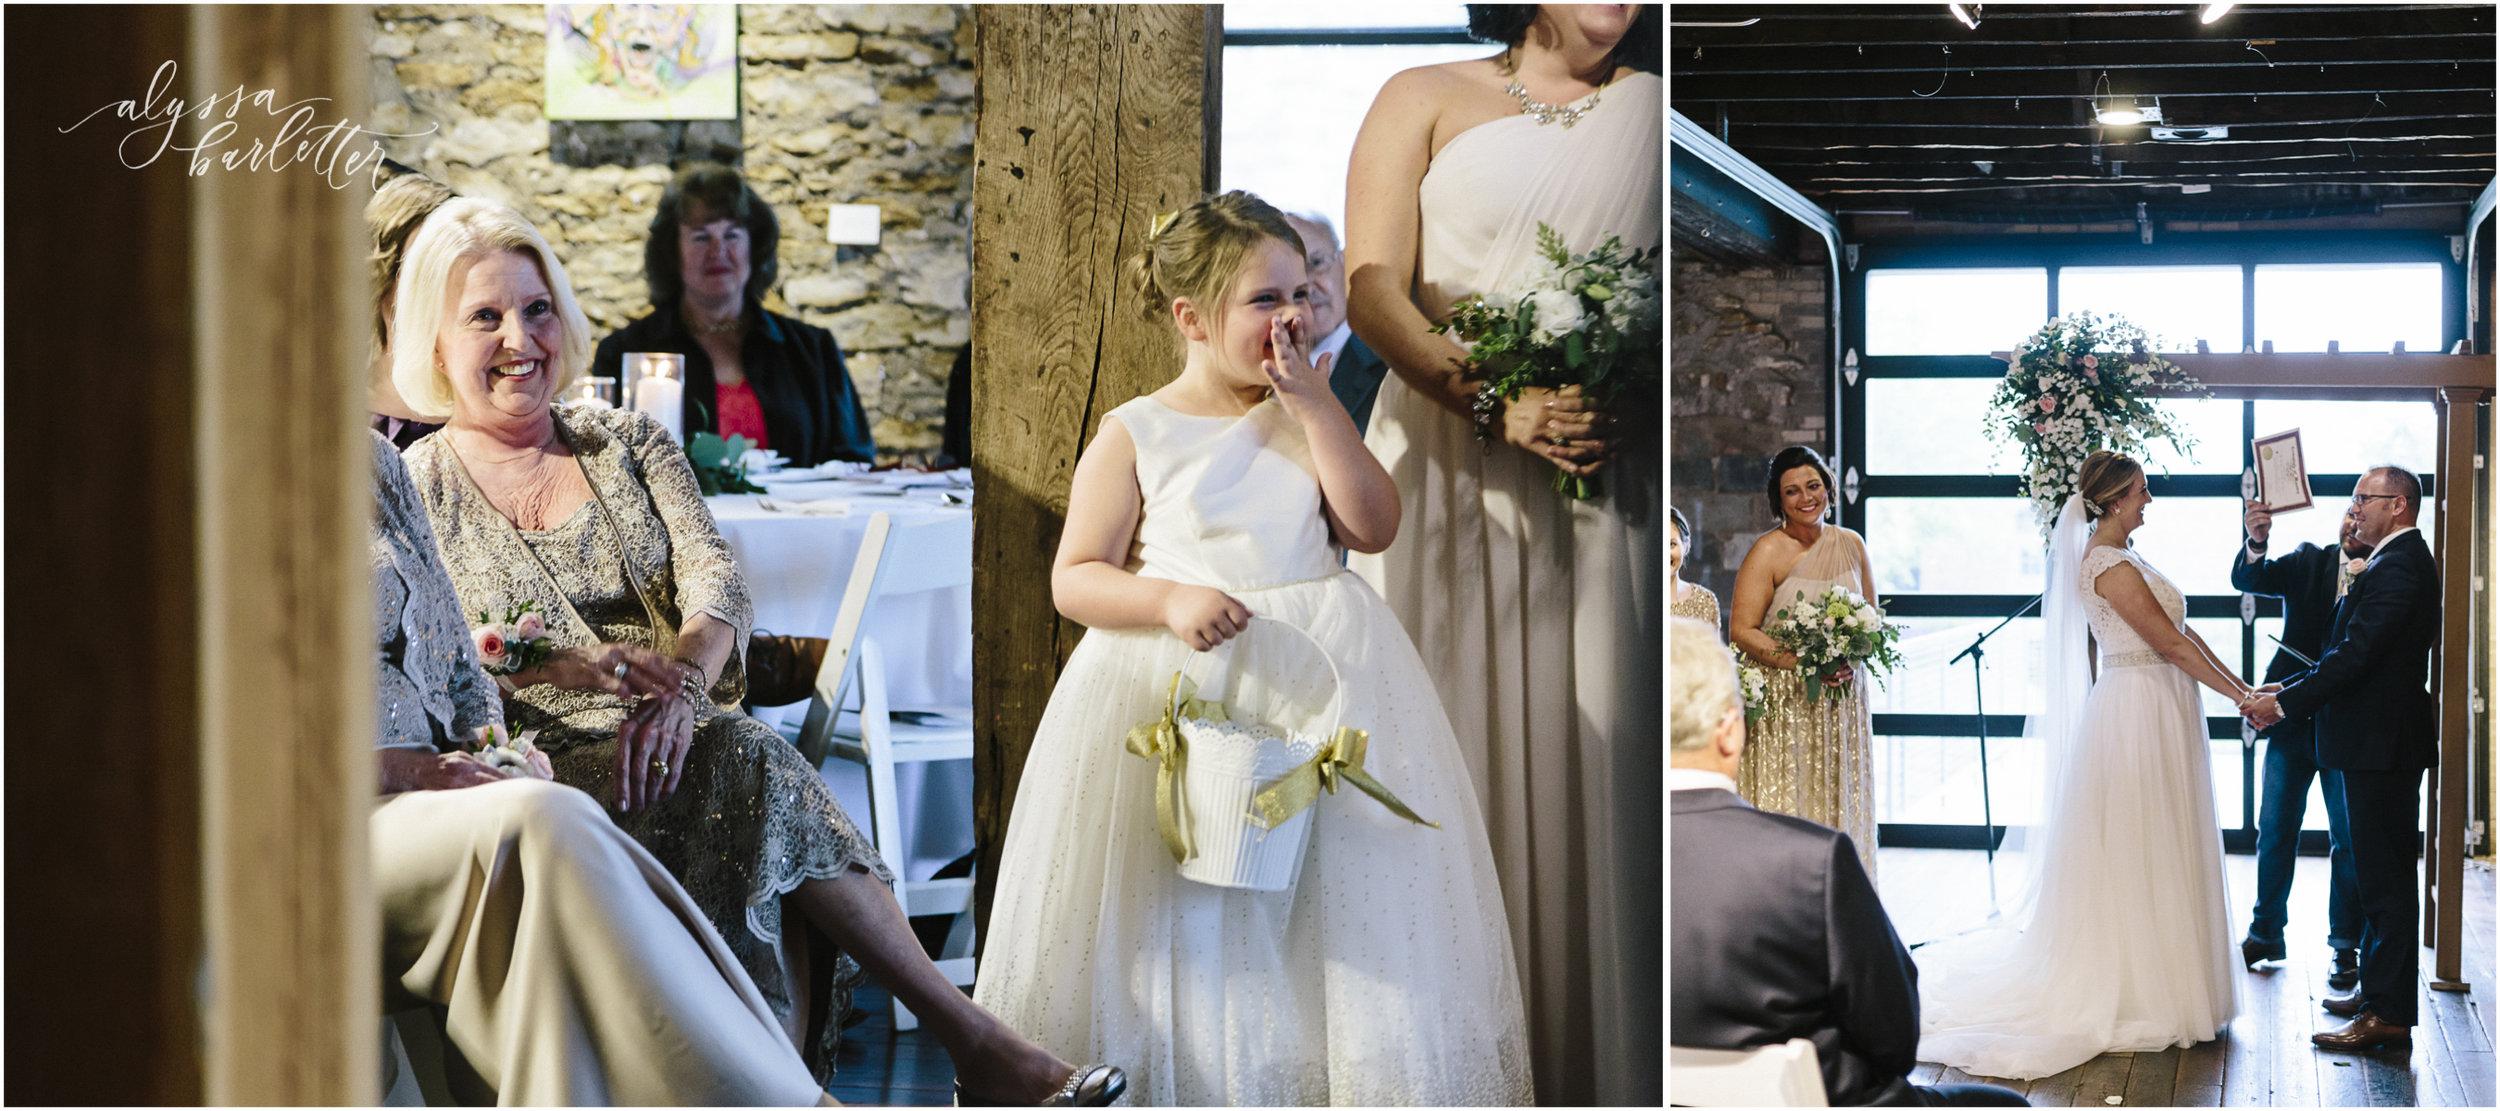 alyssa barletter photography cider gallery lawrence kansas rainy day wedding megan and brett-1-36.jpg